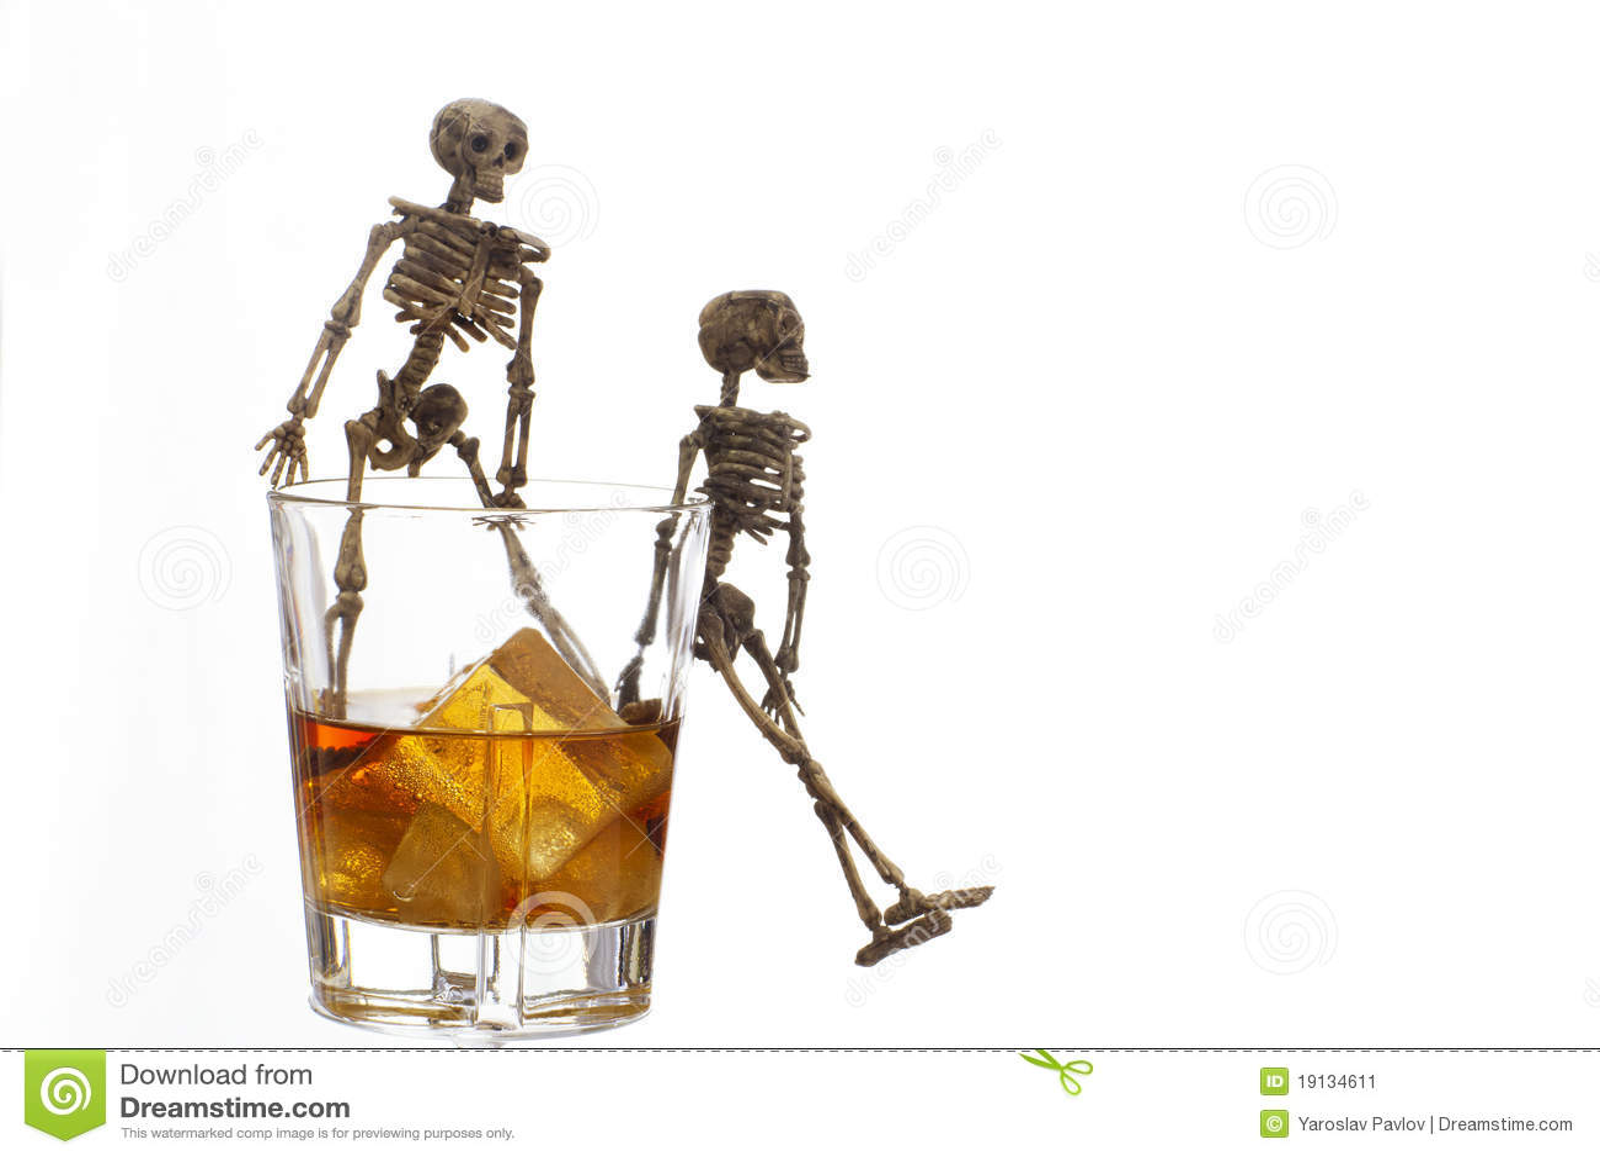 Conselhos do psicólogo a esposas a alcoólicos